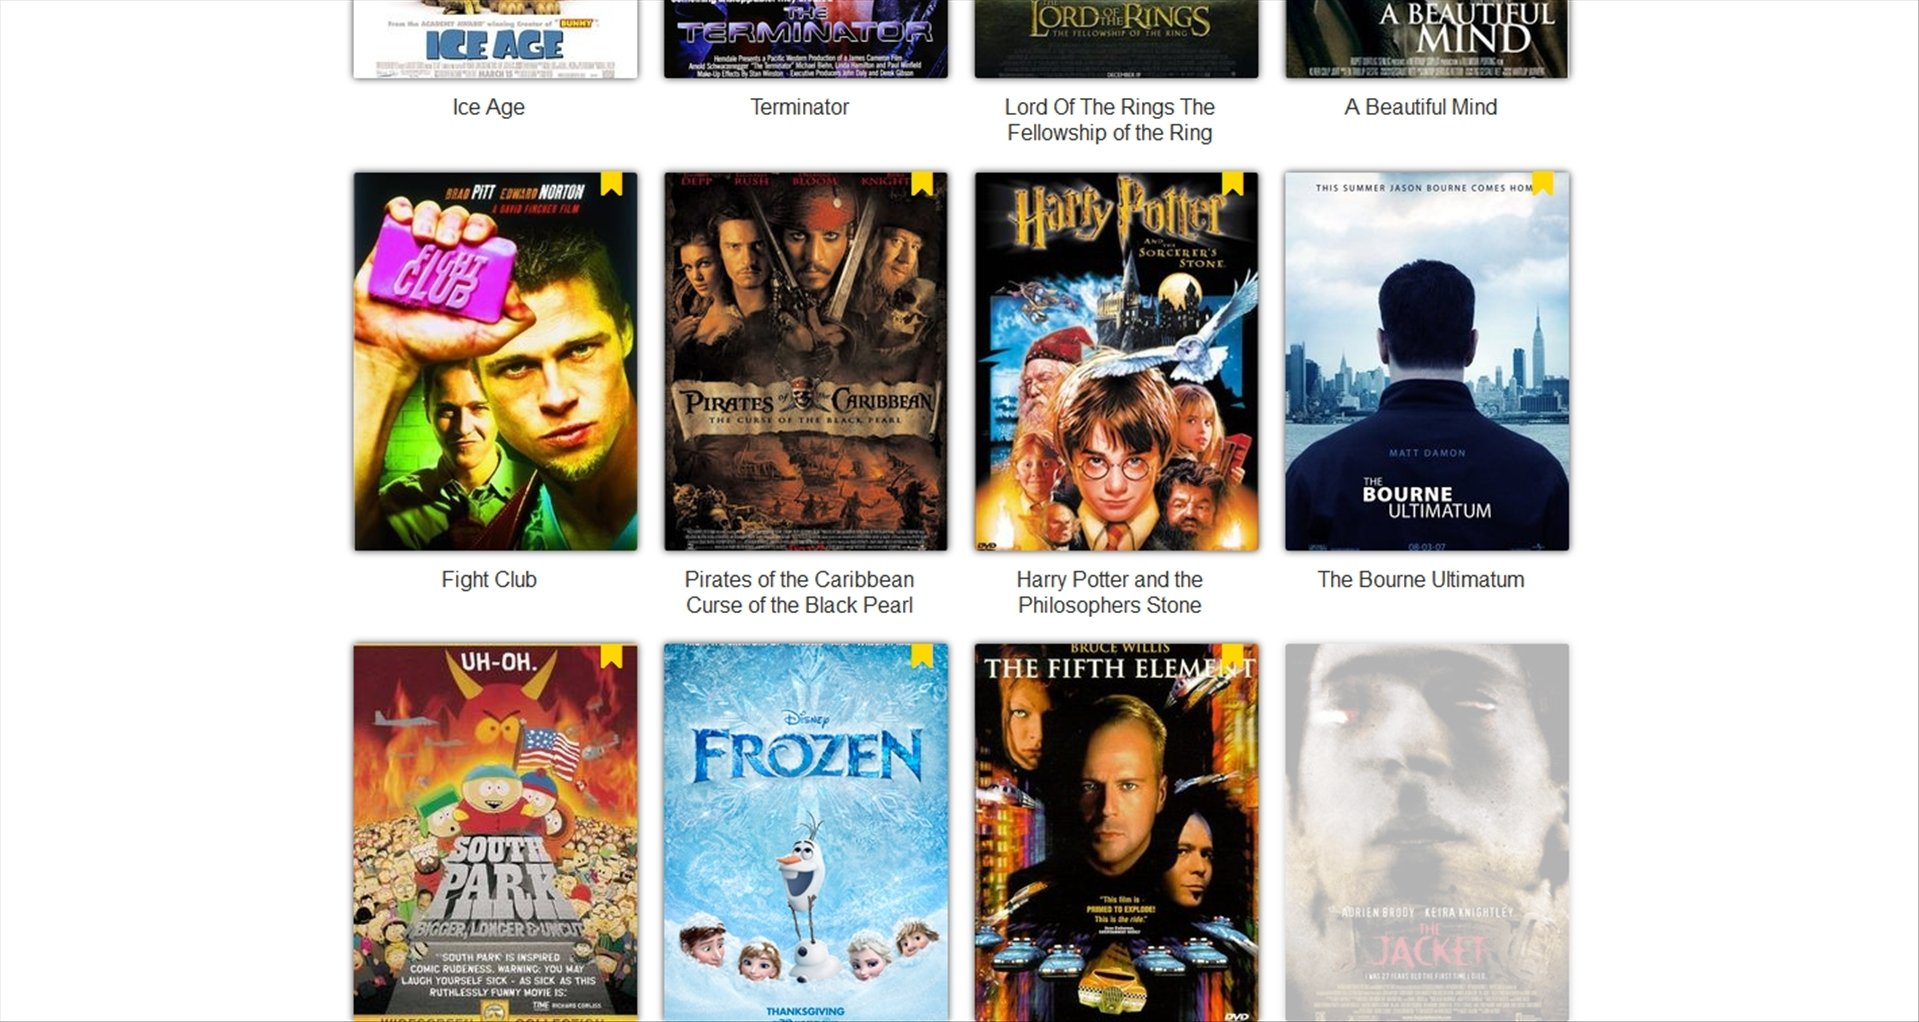 a beautiful mind english movie free download